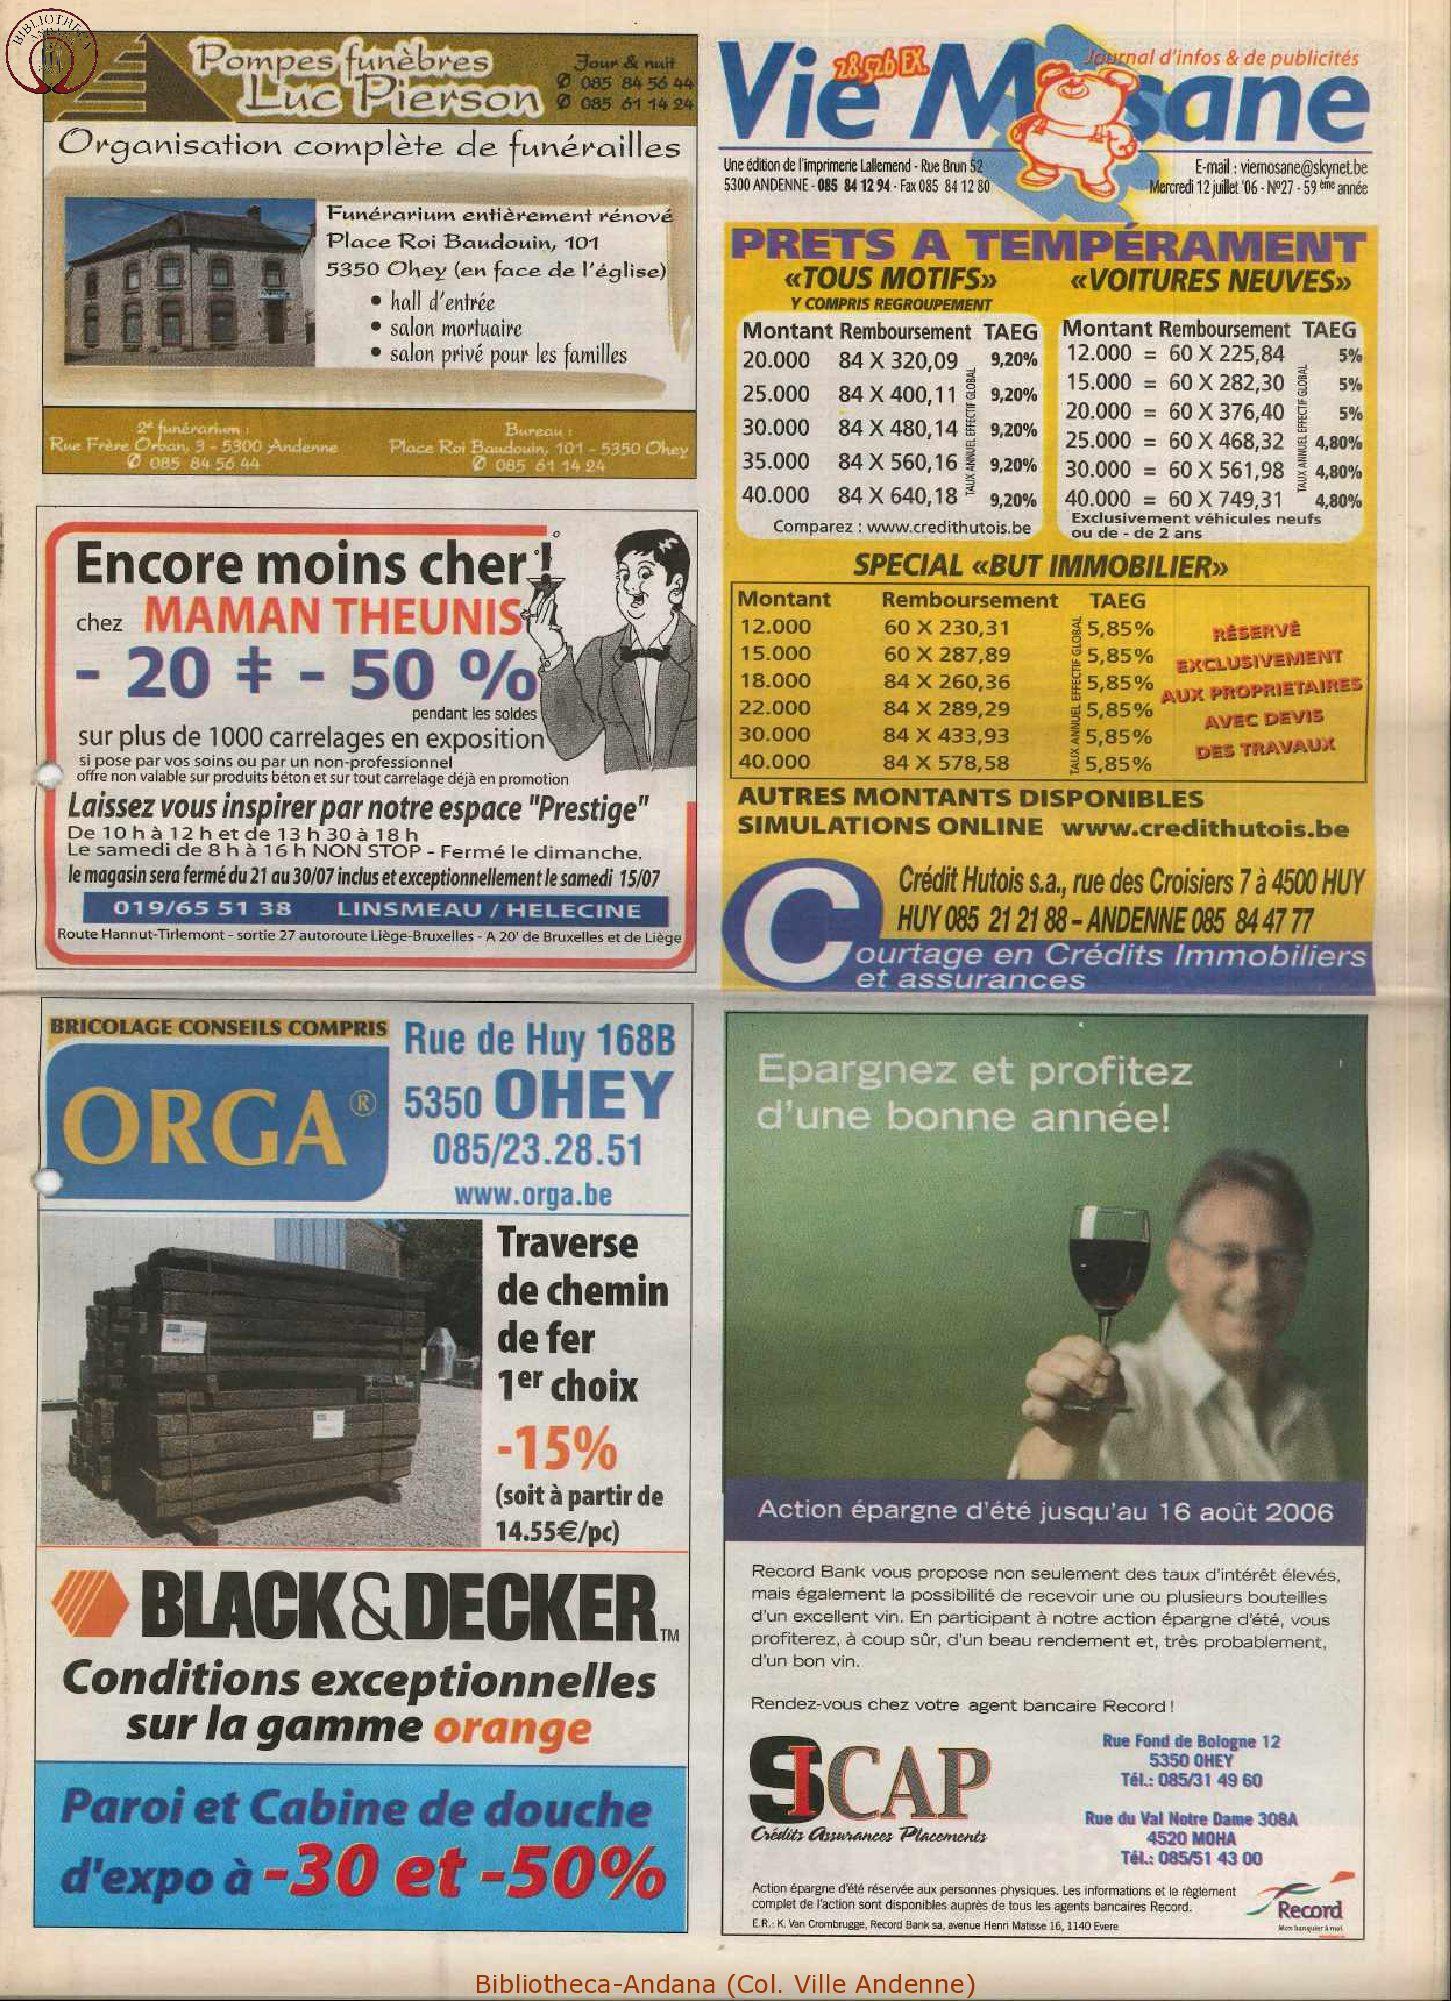 59e année - n°27 - 12 juillet 2006